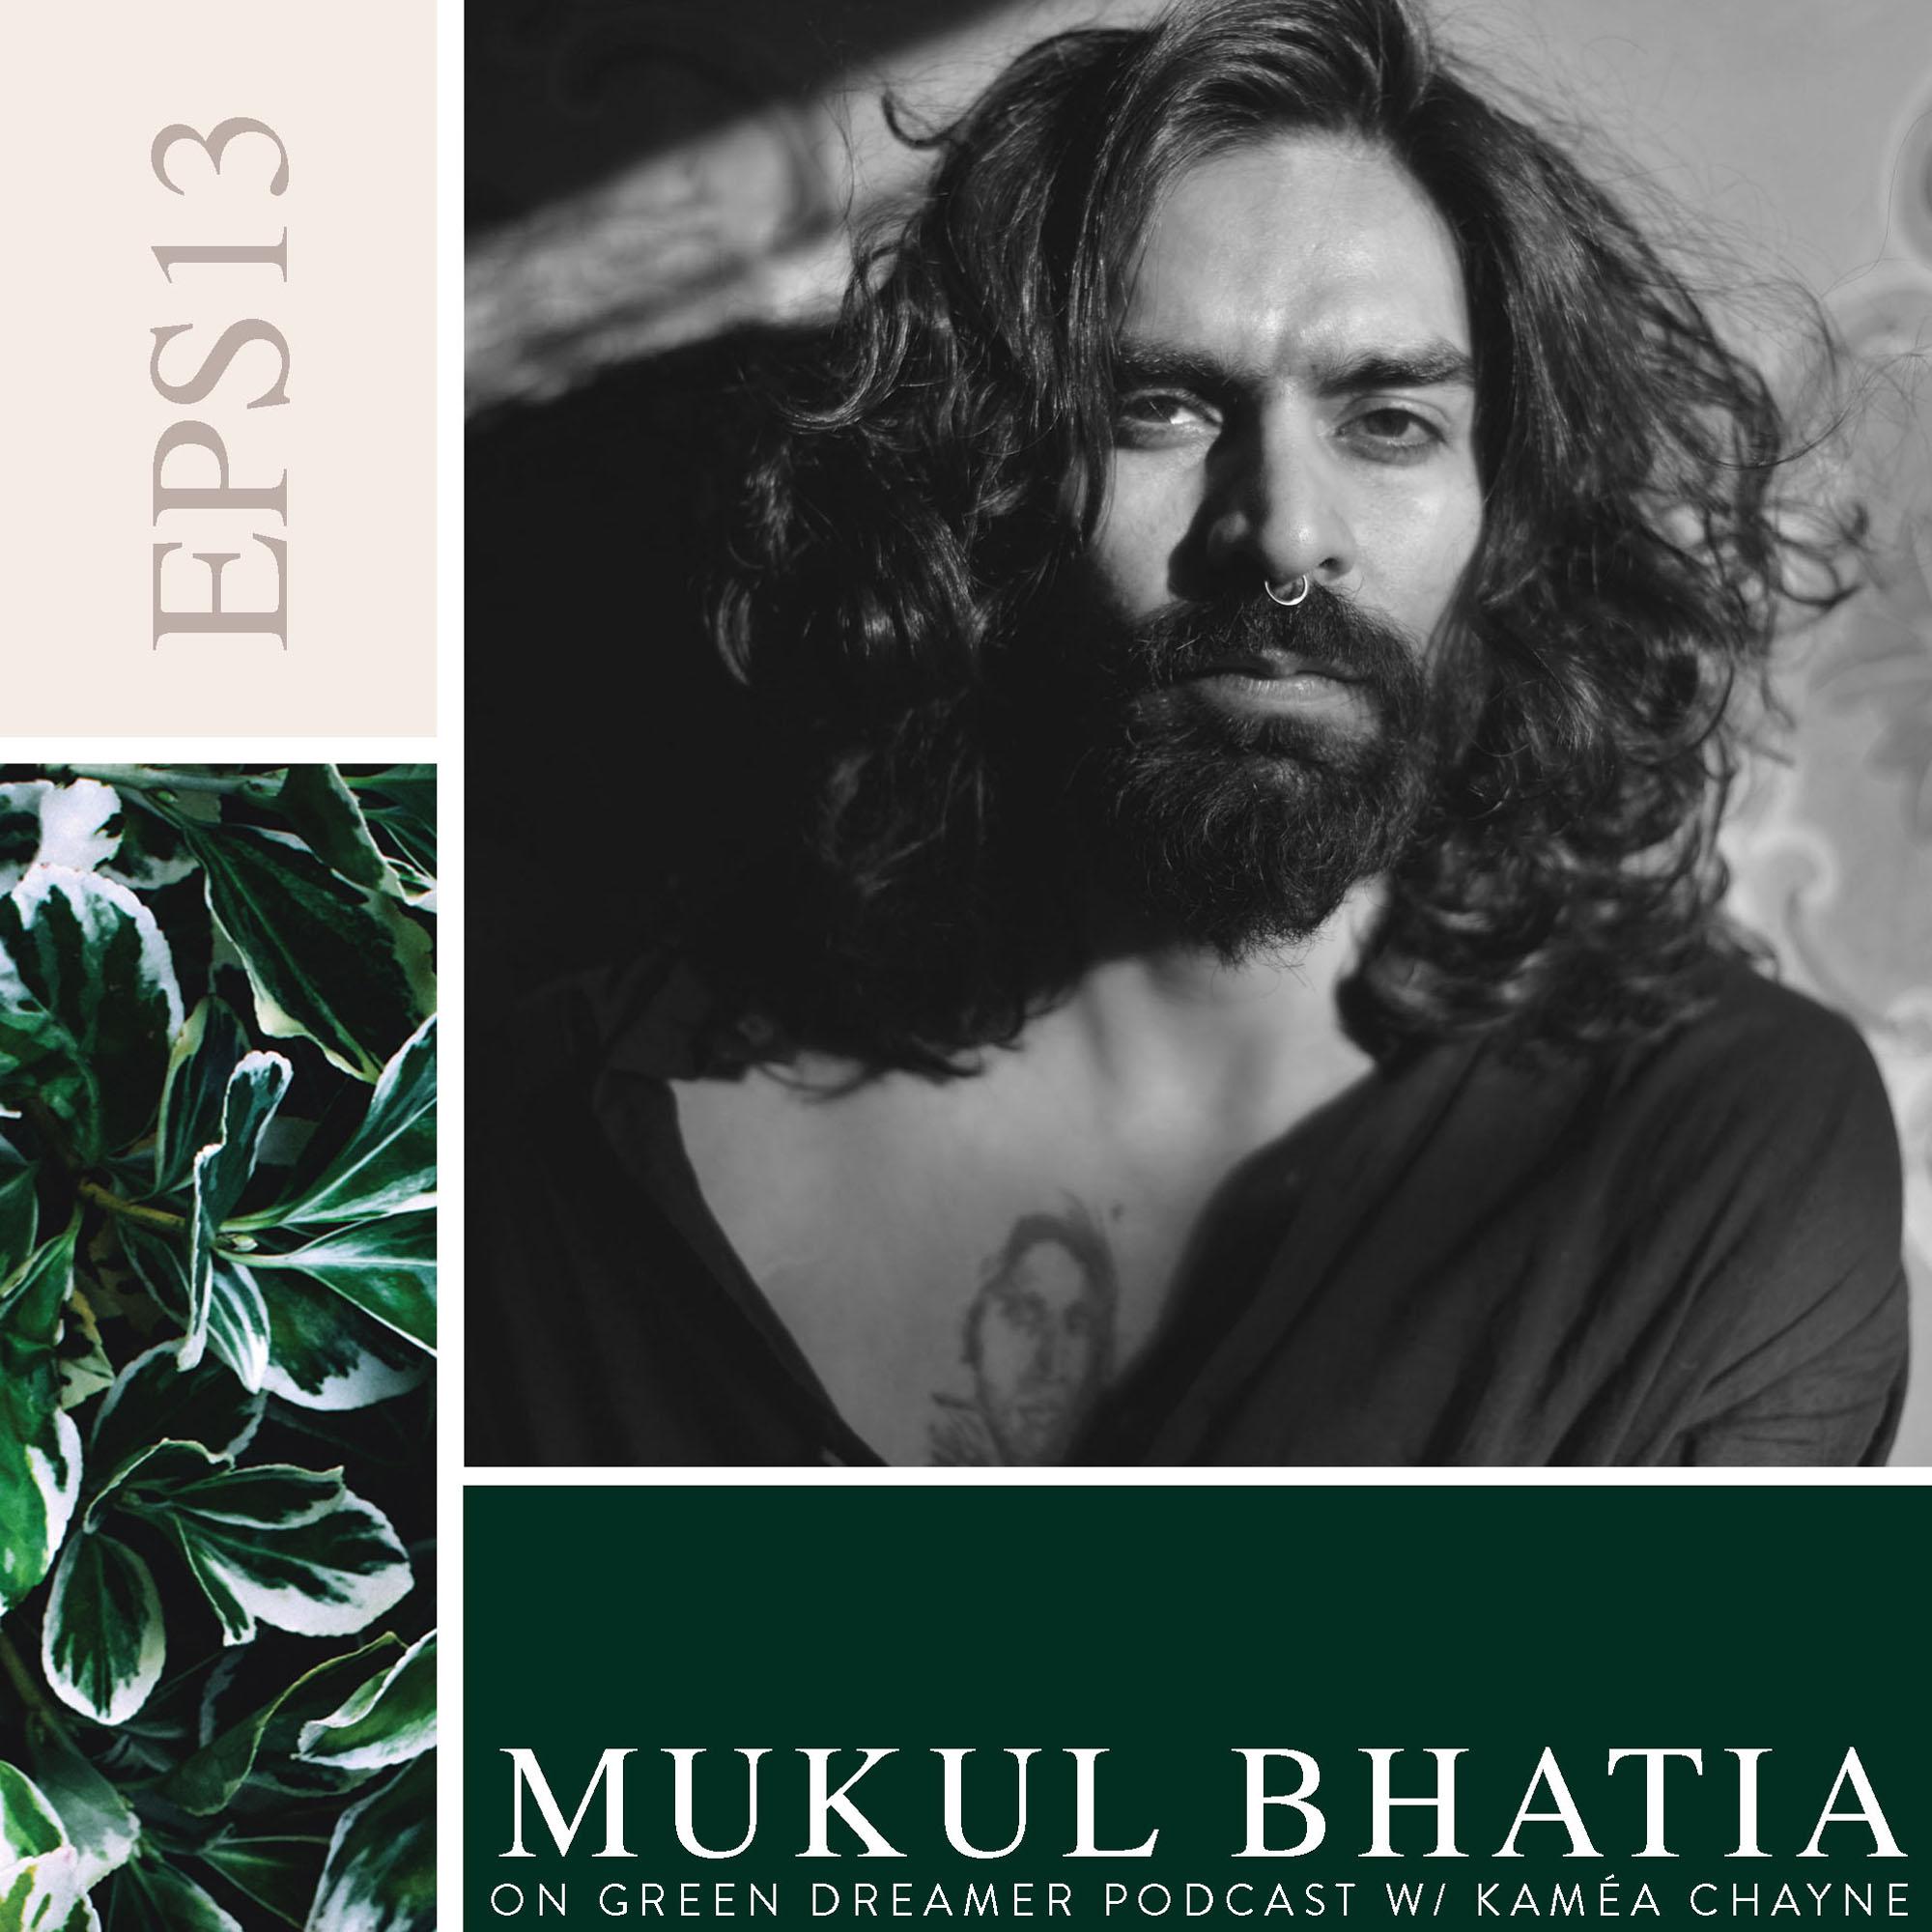 Mukul Bhatia on Sustainability via Green Dreamer Podcast with Kaméa Chayne